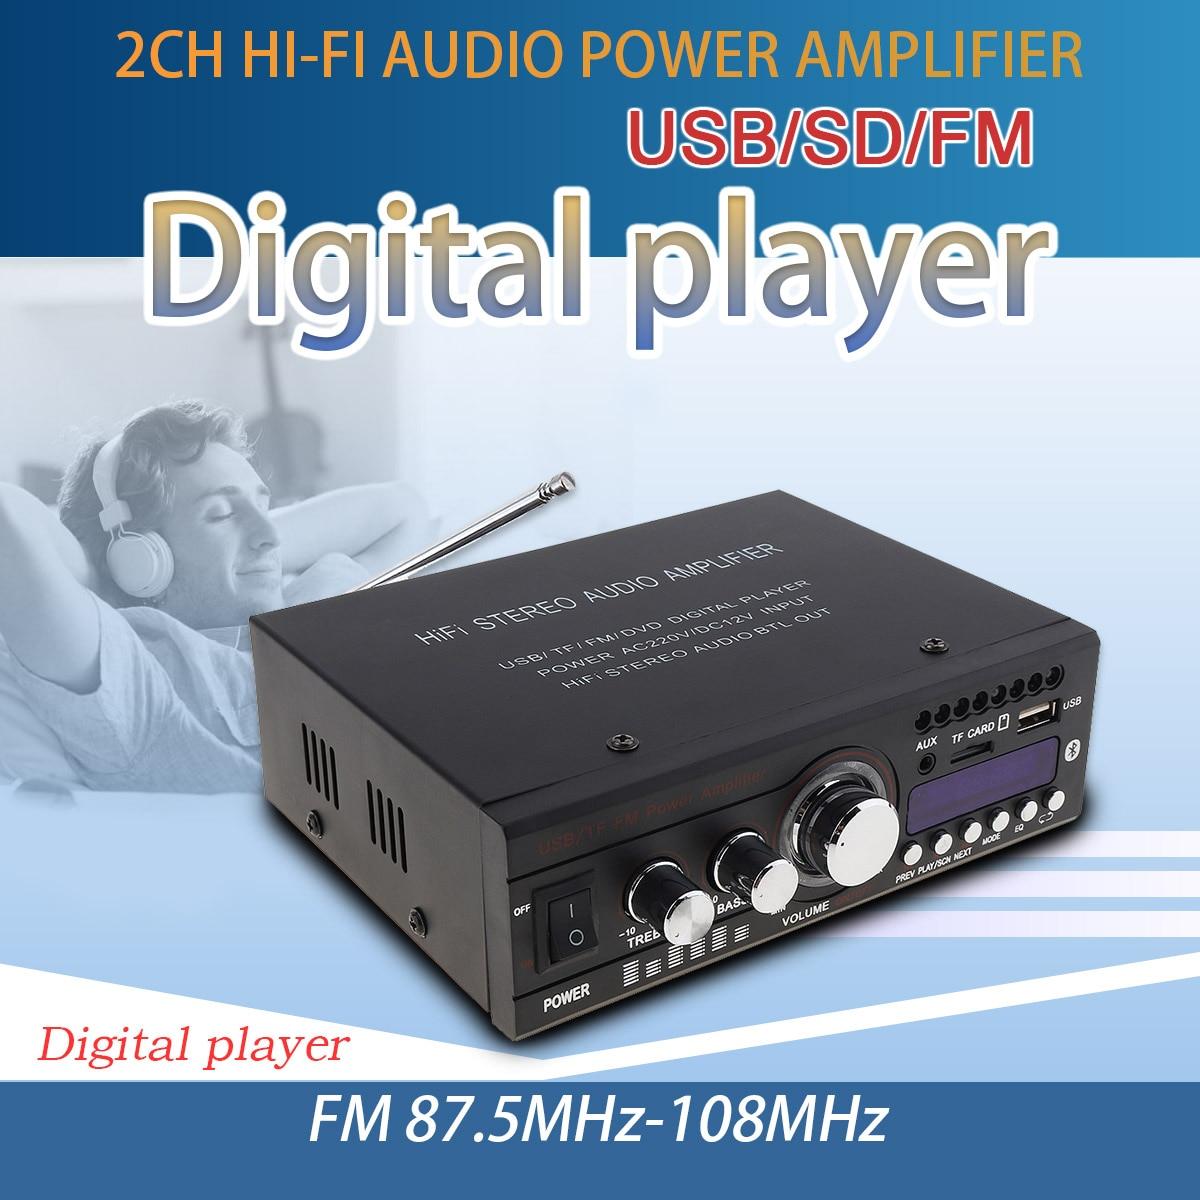 DC 12V / AC 220V Bluetooth 2CH HiFi Car Stereo Audio Power Amplifier FM Radio Auto Hi Fi Digital Player Support USB SD FM DVD